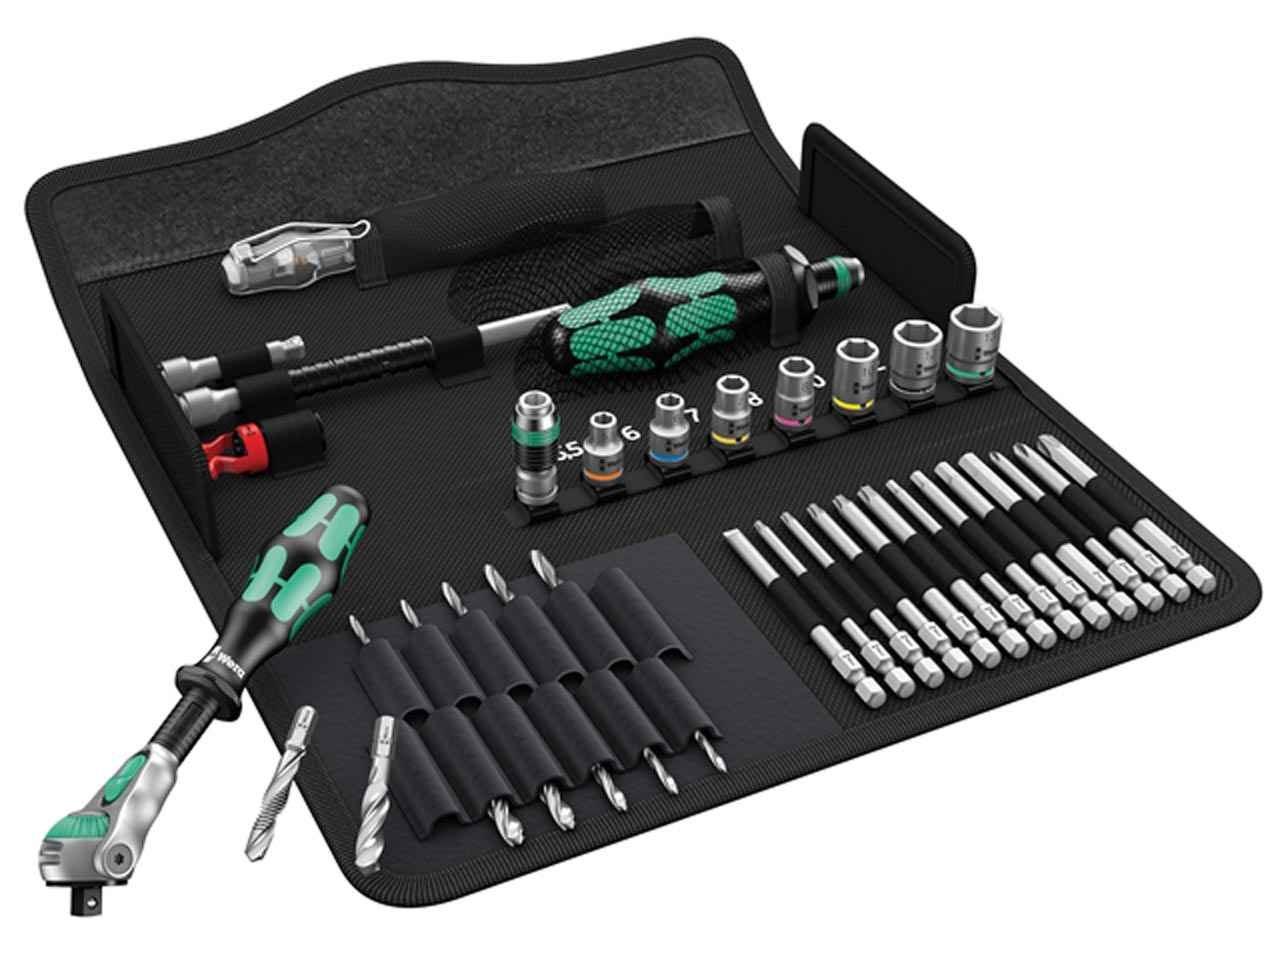 wera 05135928001 kraftform kompact h1 metal tool set 39 piece. Black Bedroom Furniture Sets. Home Design Ideas